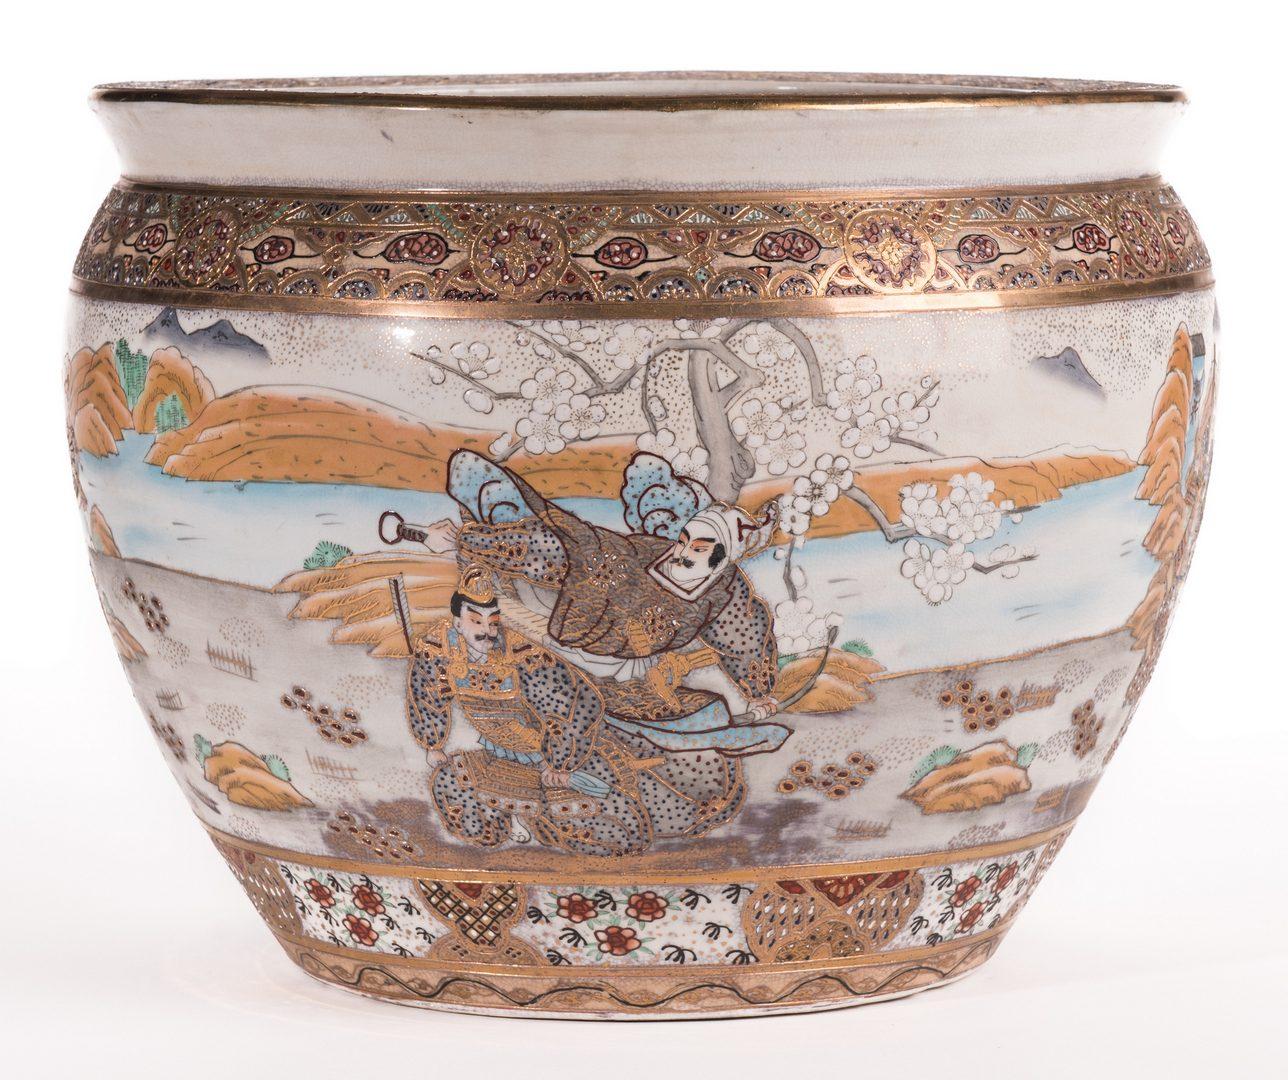 Lot 188: Japanese Satsuma Porcelain Fish Bowl